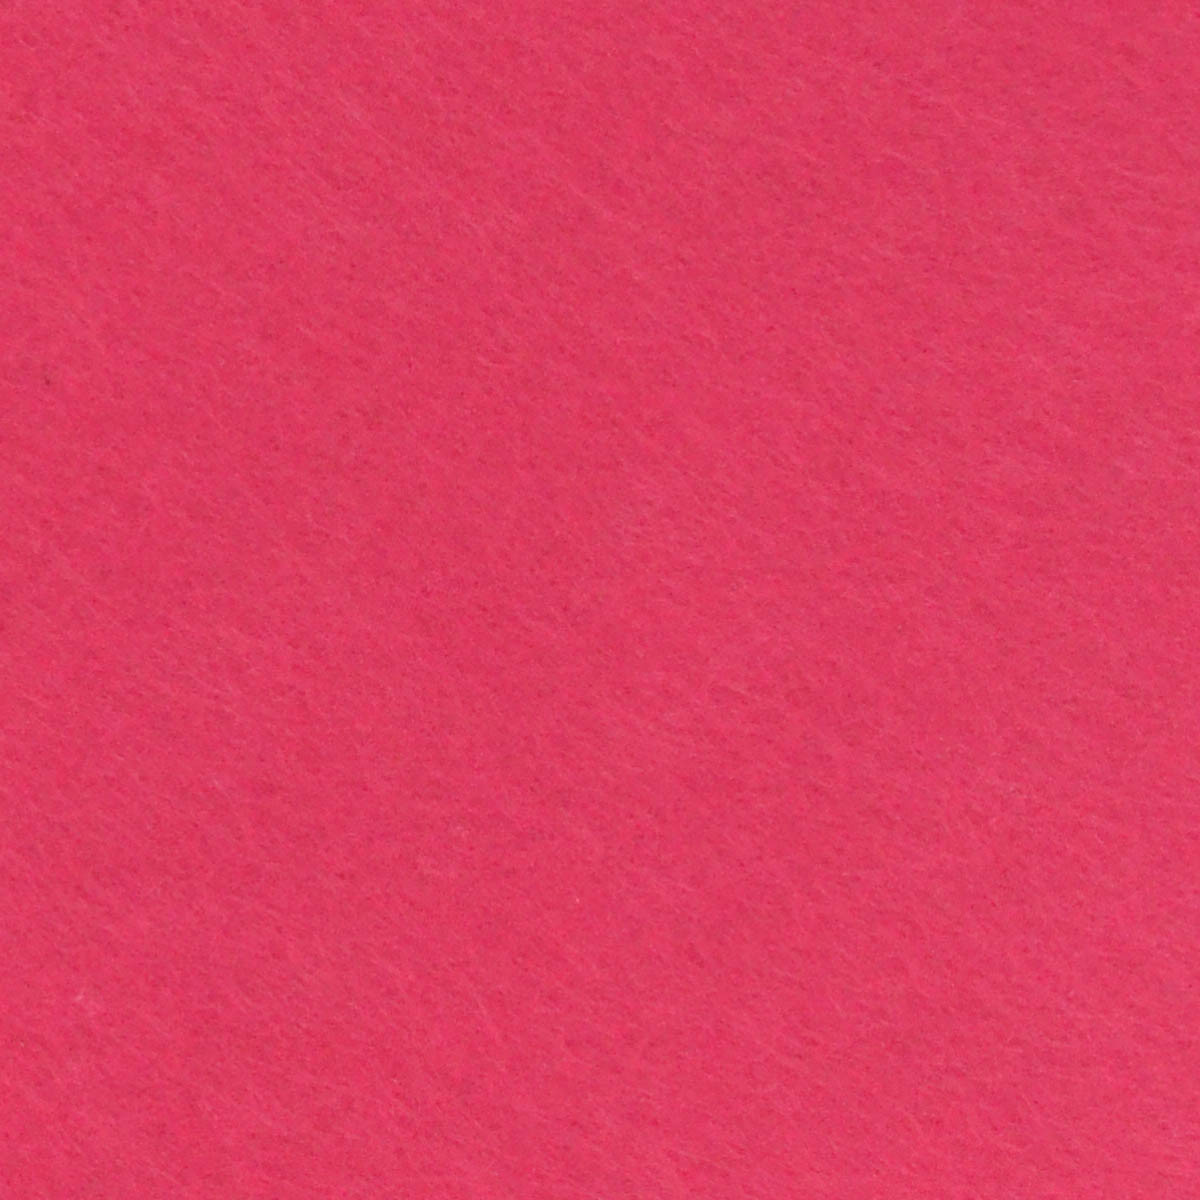 Набор Фетр Santi жесткий, розовый, 21*30см (10л)